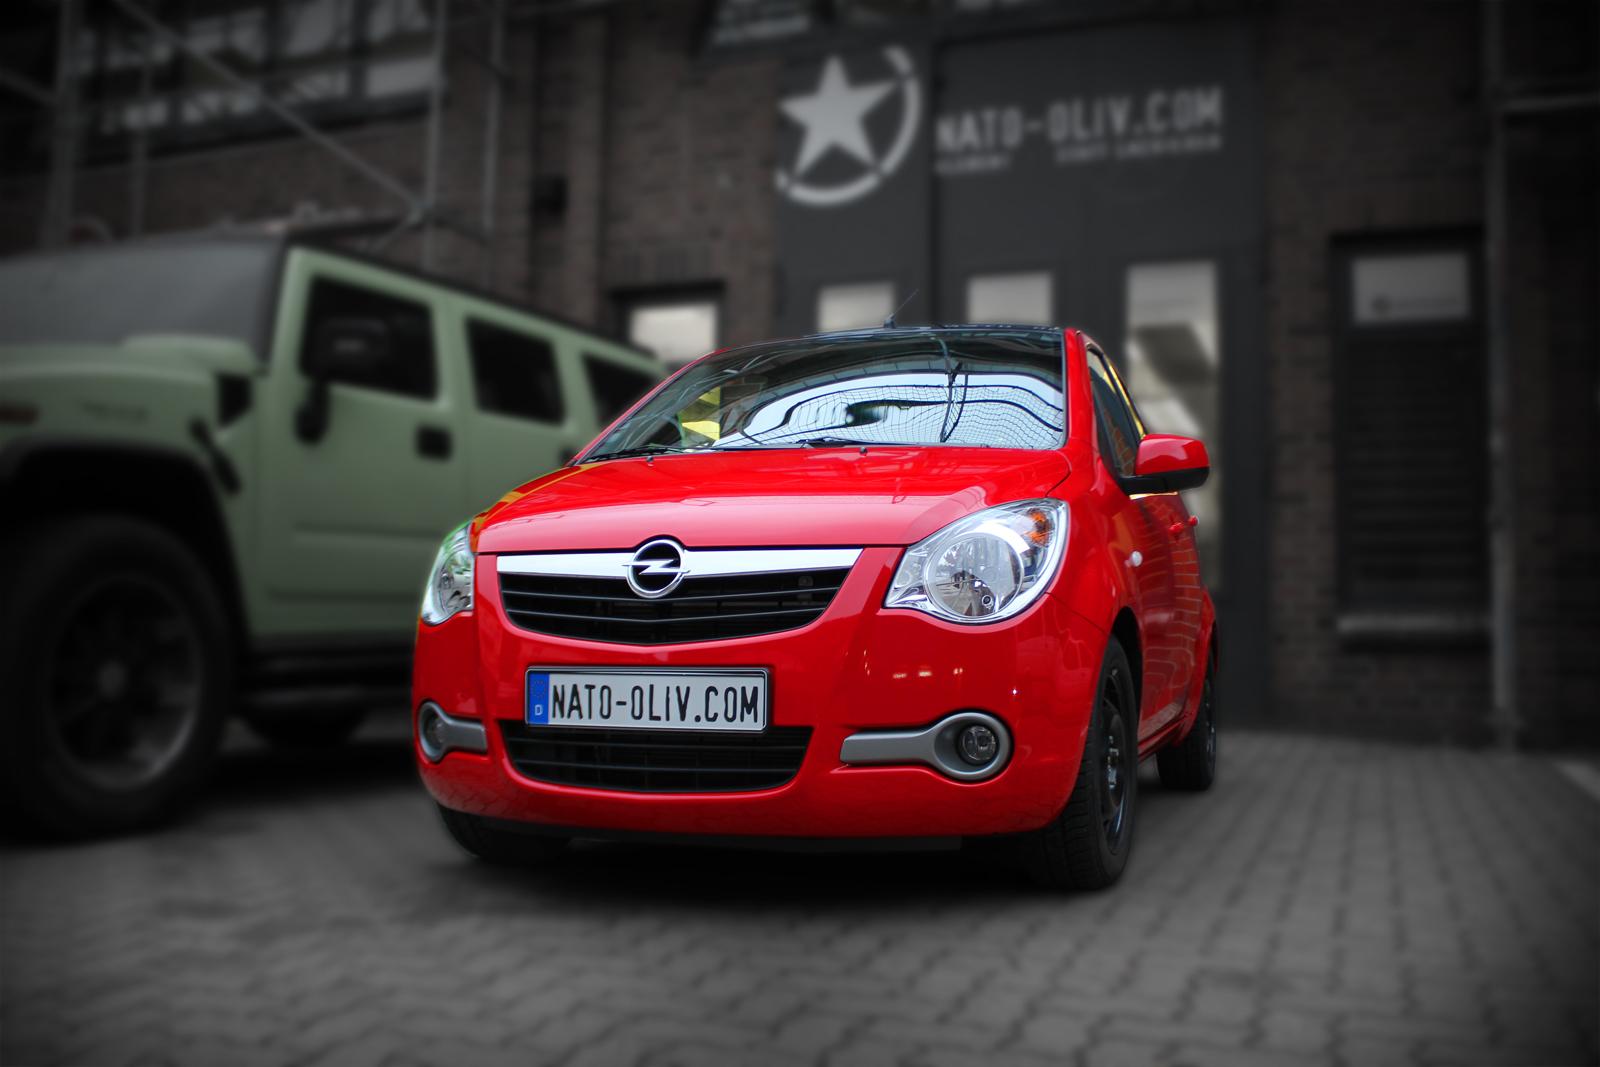 Opel_Agila_Folierung_Rot_Glanz_Titelbild